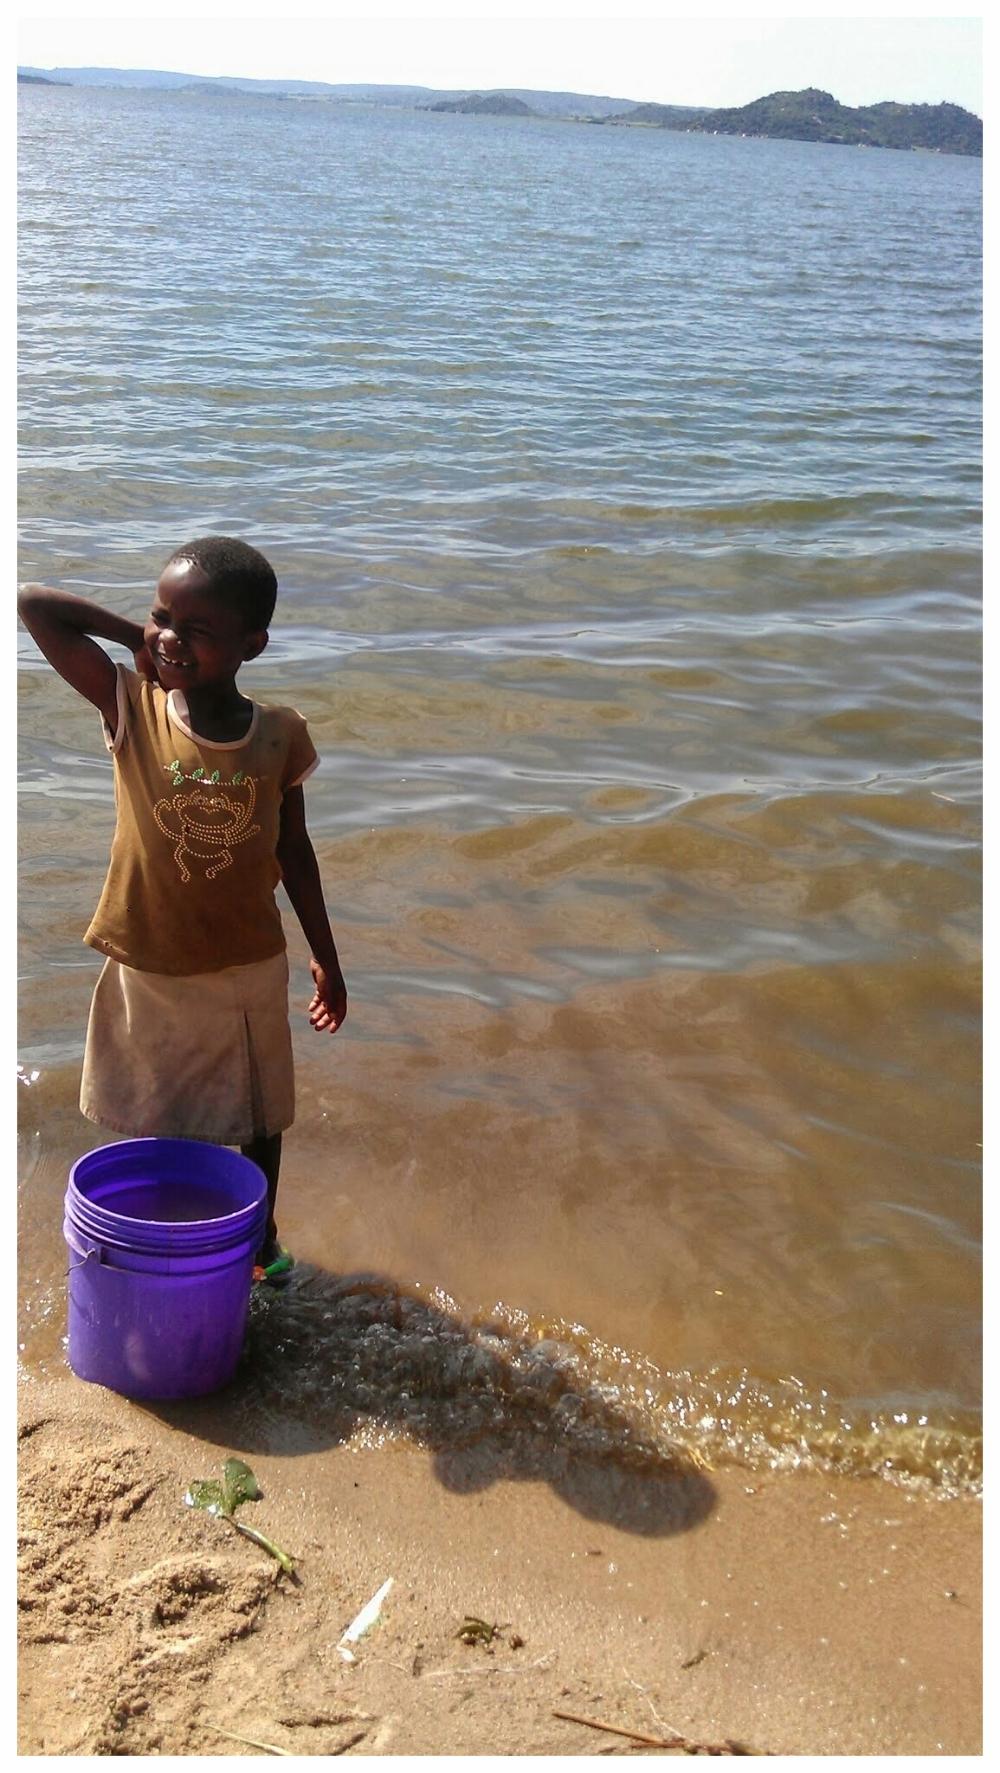 Schistosomiasis transmission site in Lake Victoria